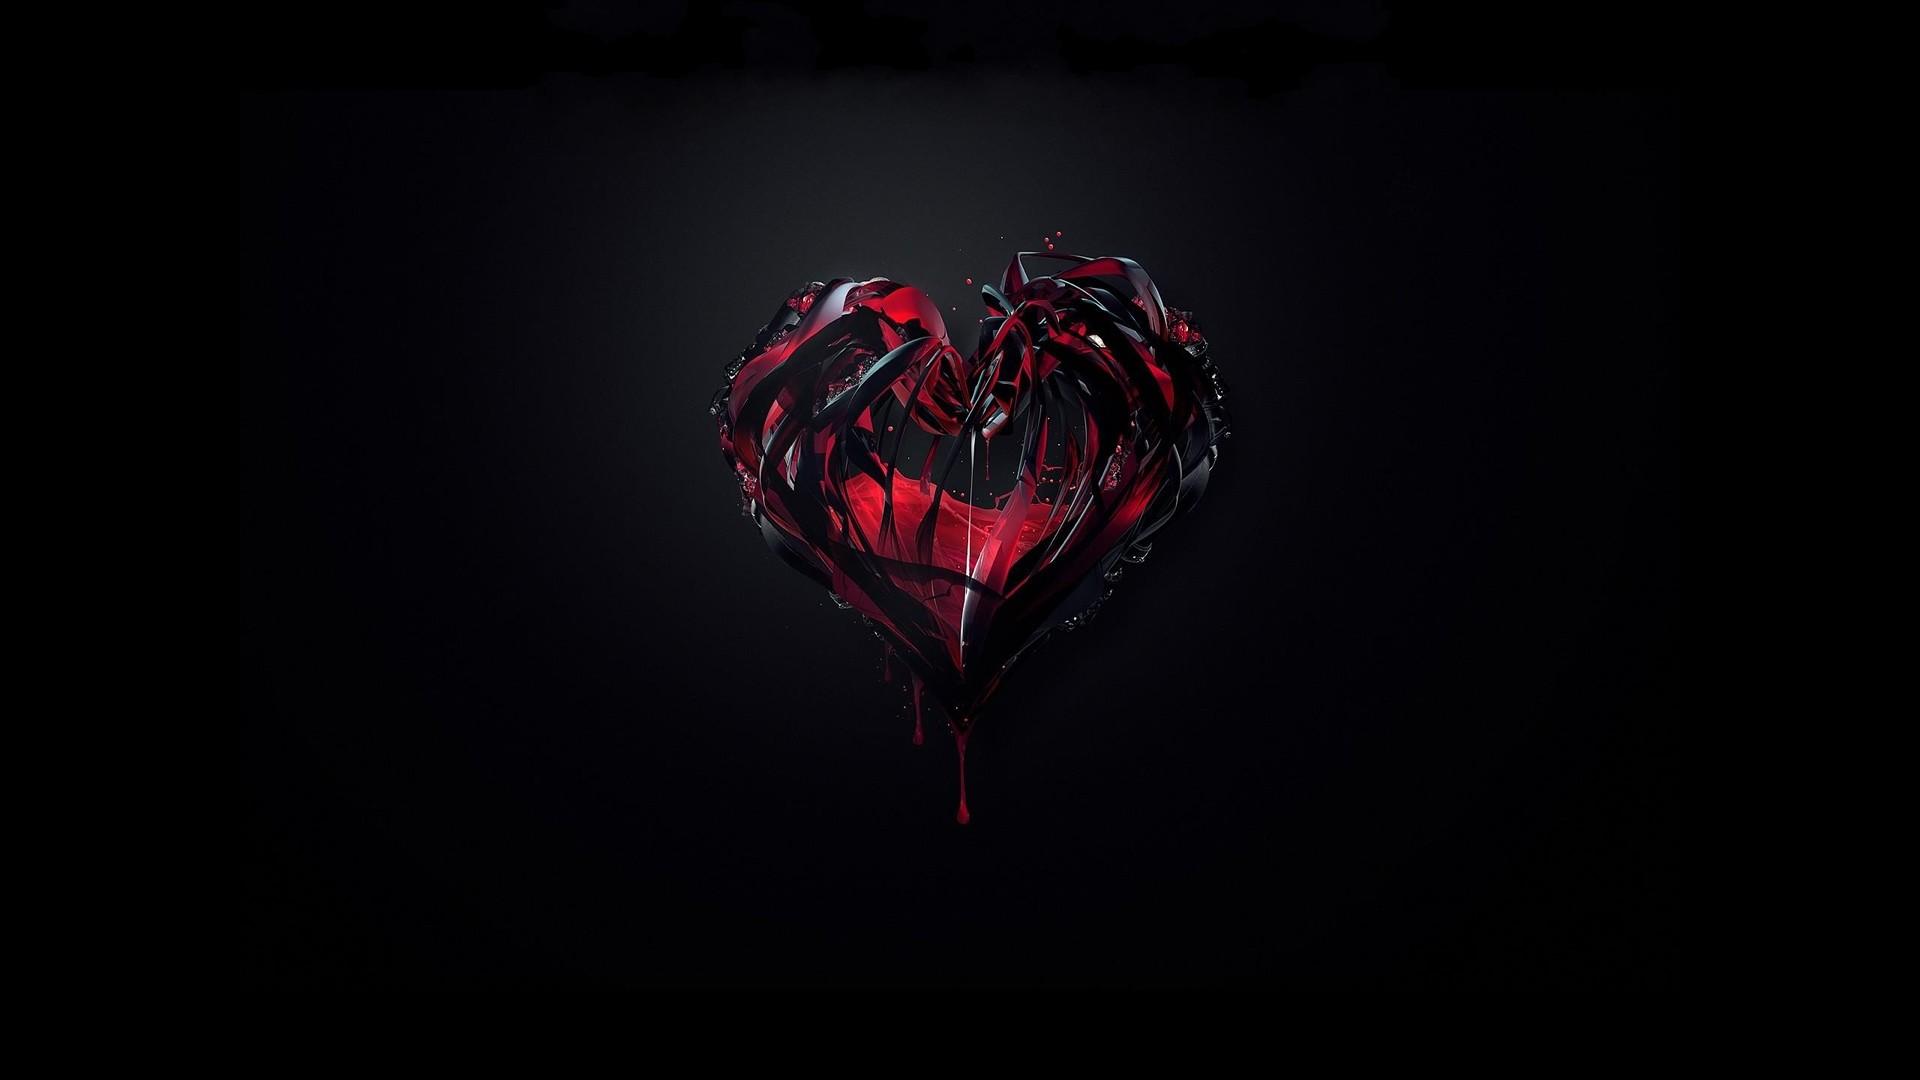 Love Dark wallpaper photo hd